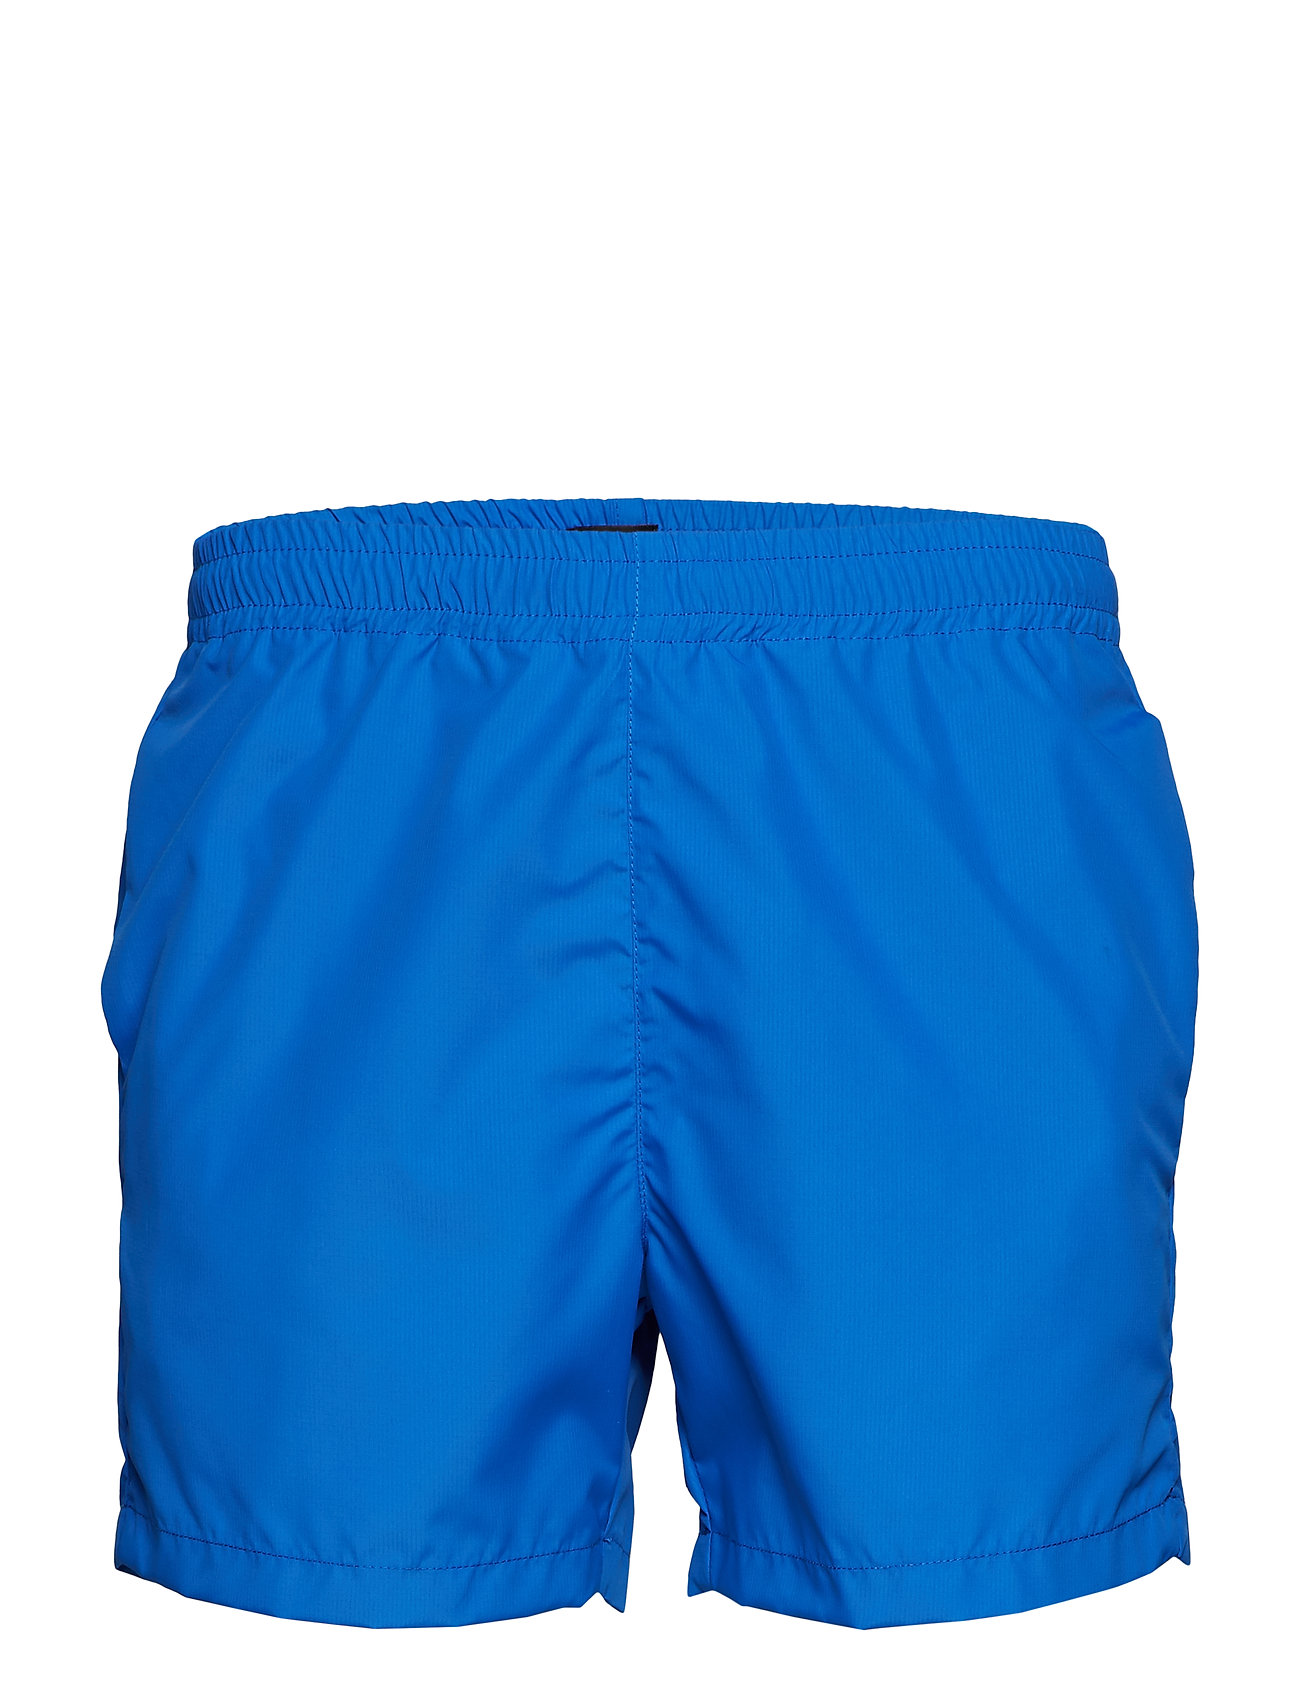 Mads Nørgaard Beach Ripstop Swim - LAPIS BLUE